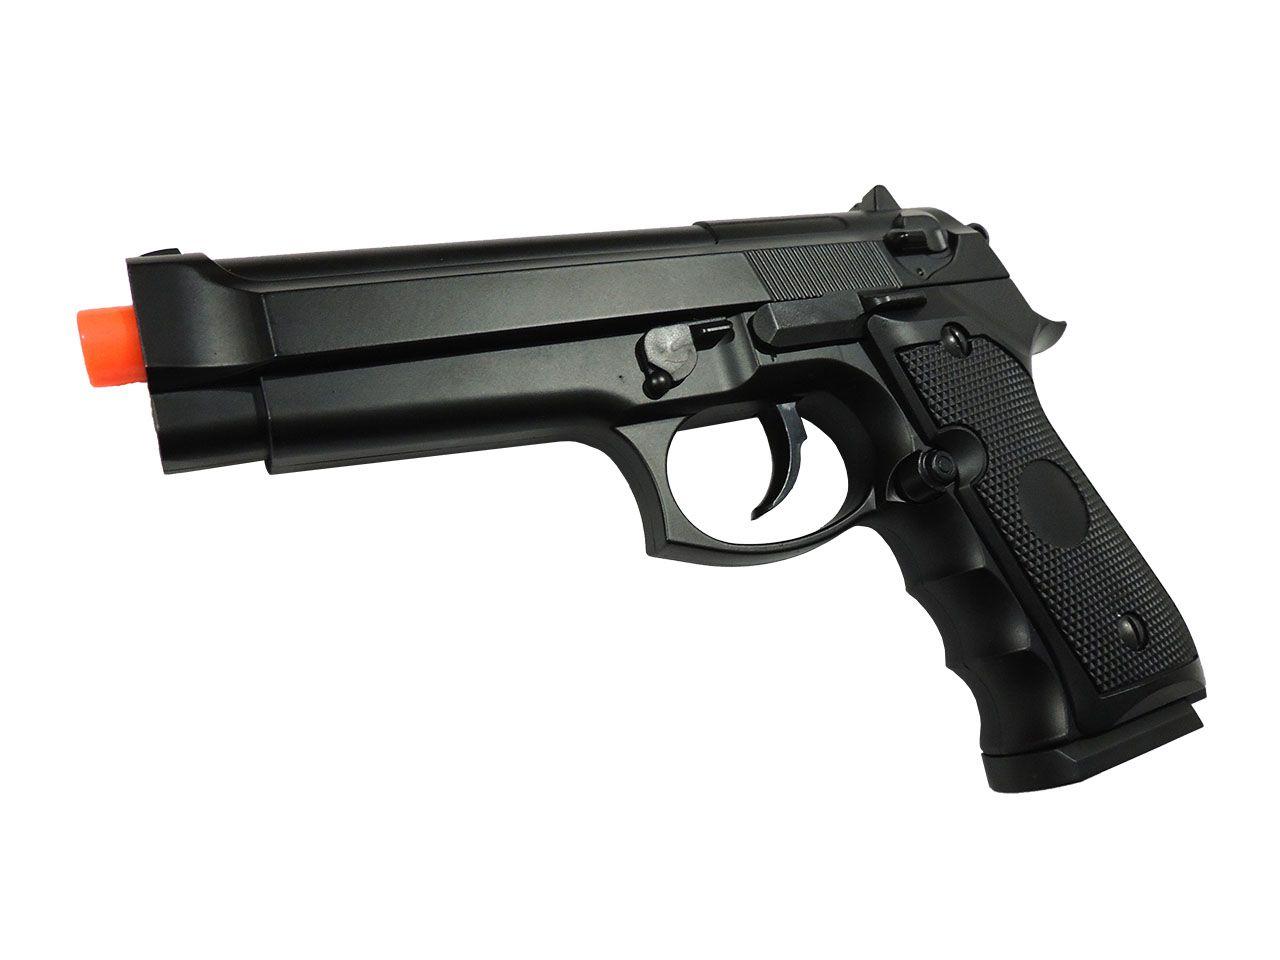 Pistola de Airsoft Spring Double Eagle Beretta 92 M296 Full Metal 6mm